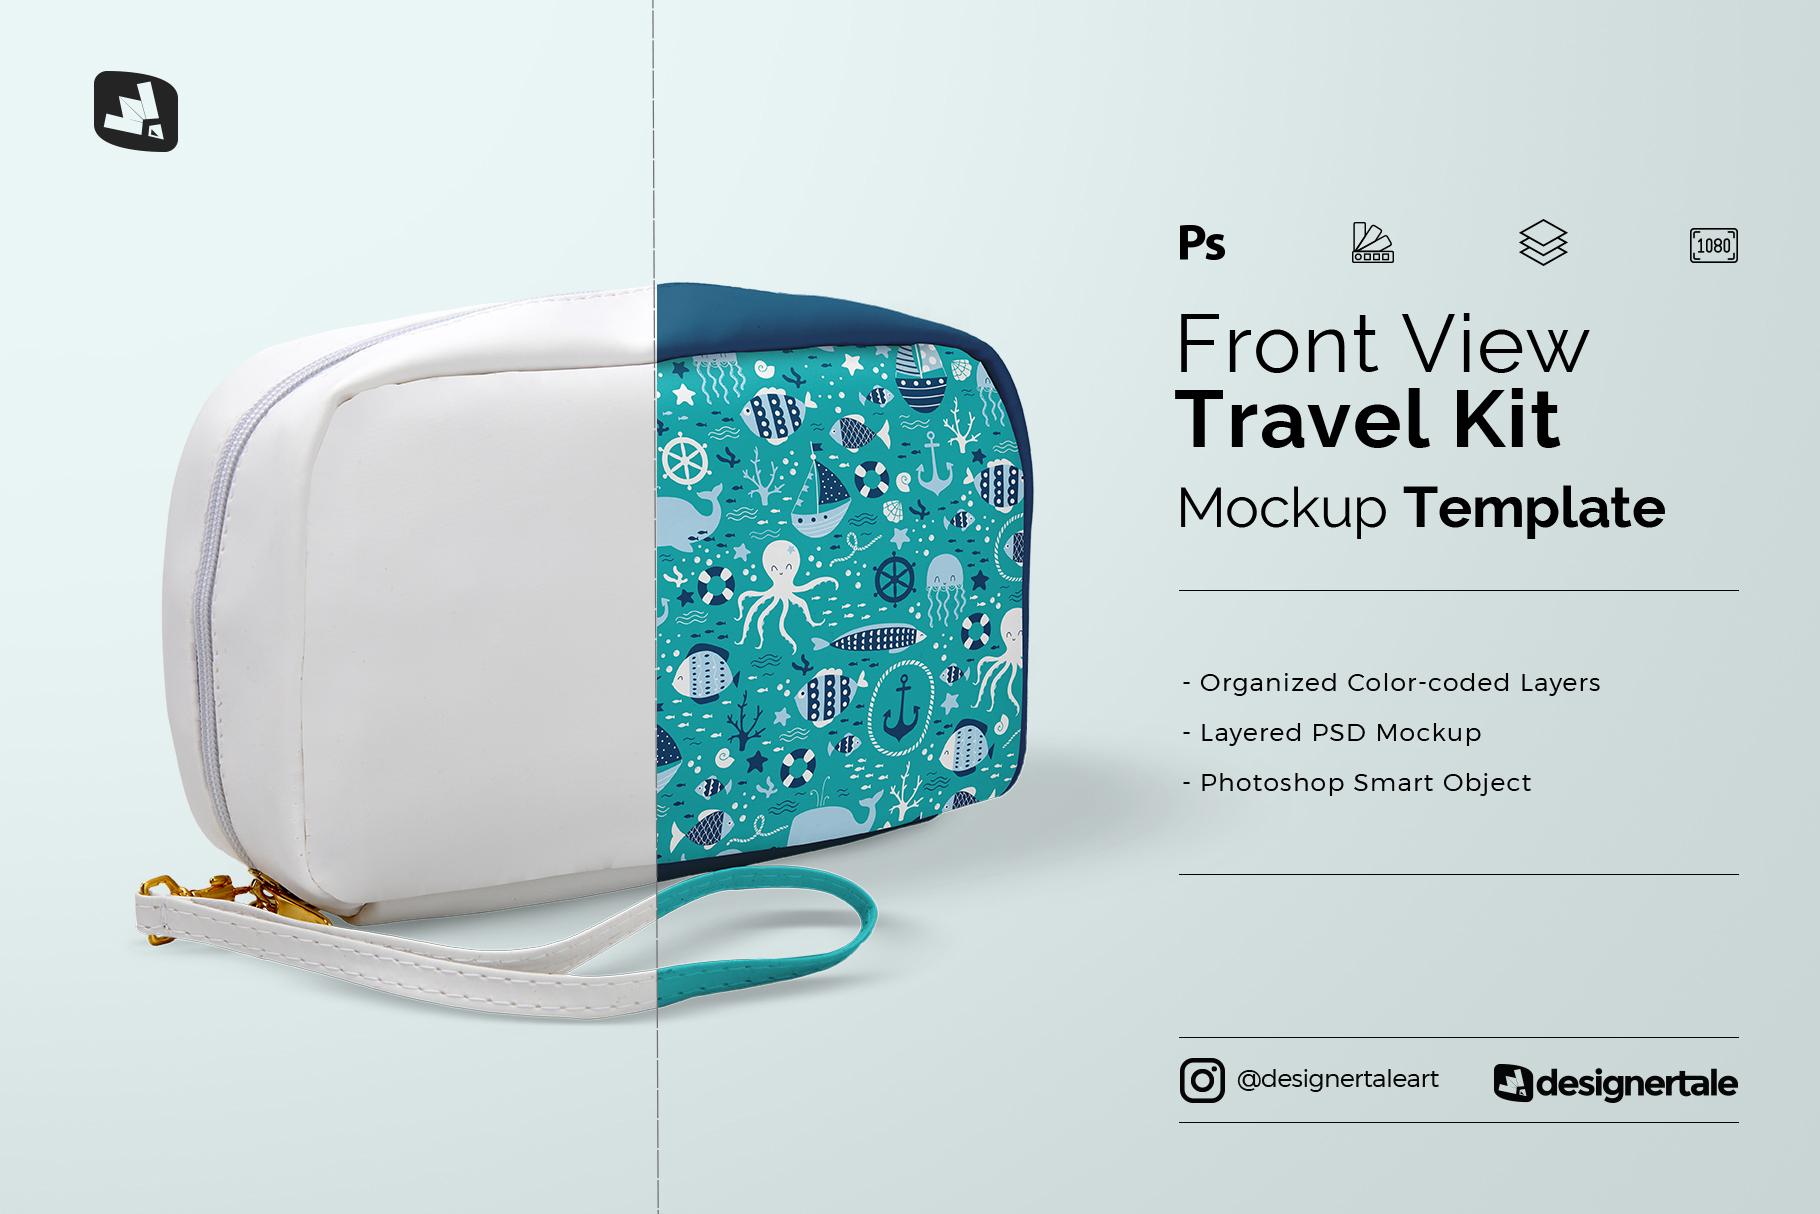 front view travel kit mockup